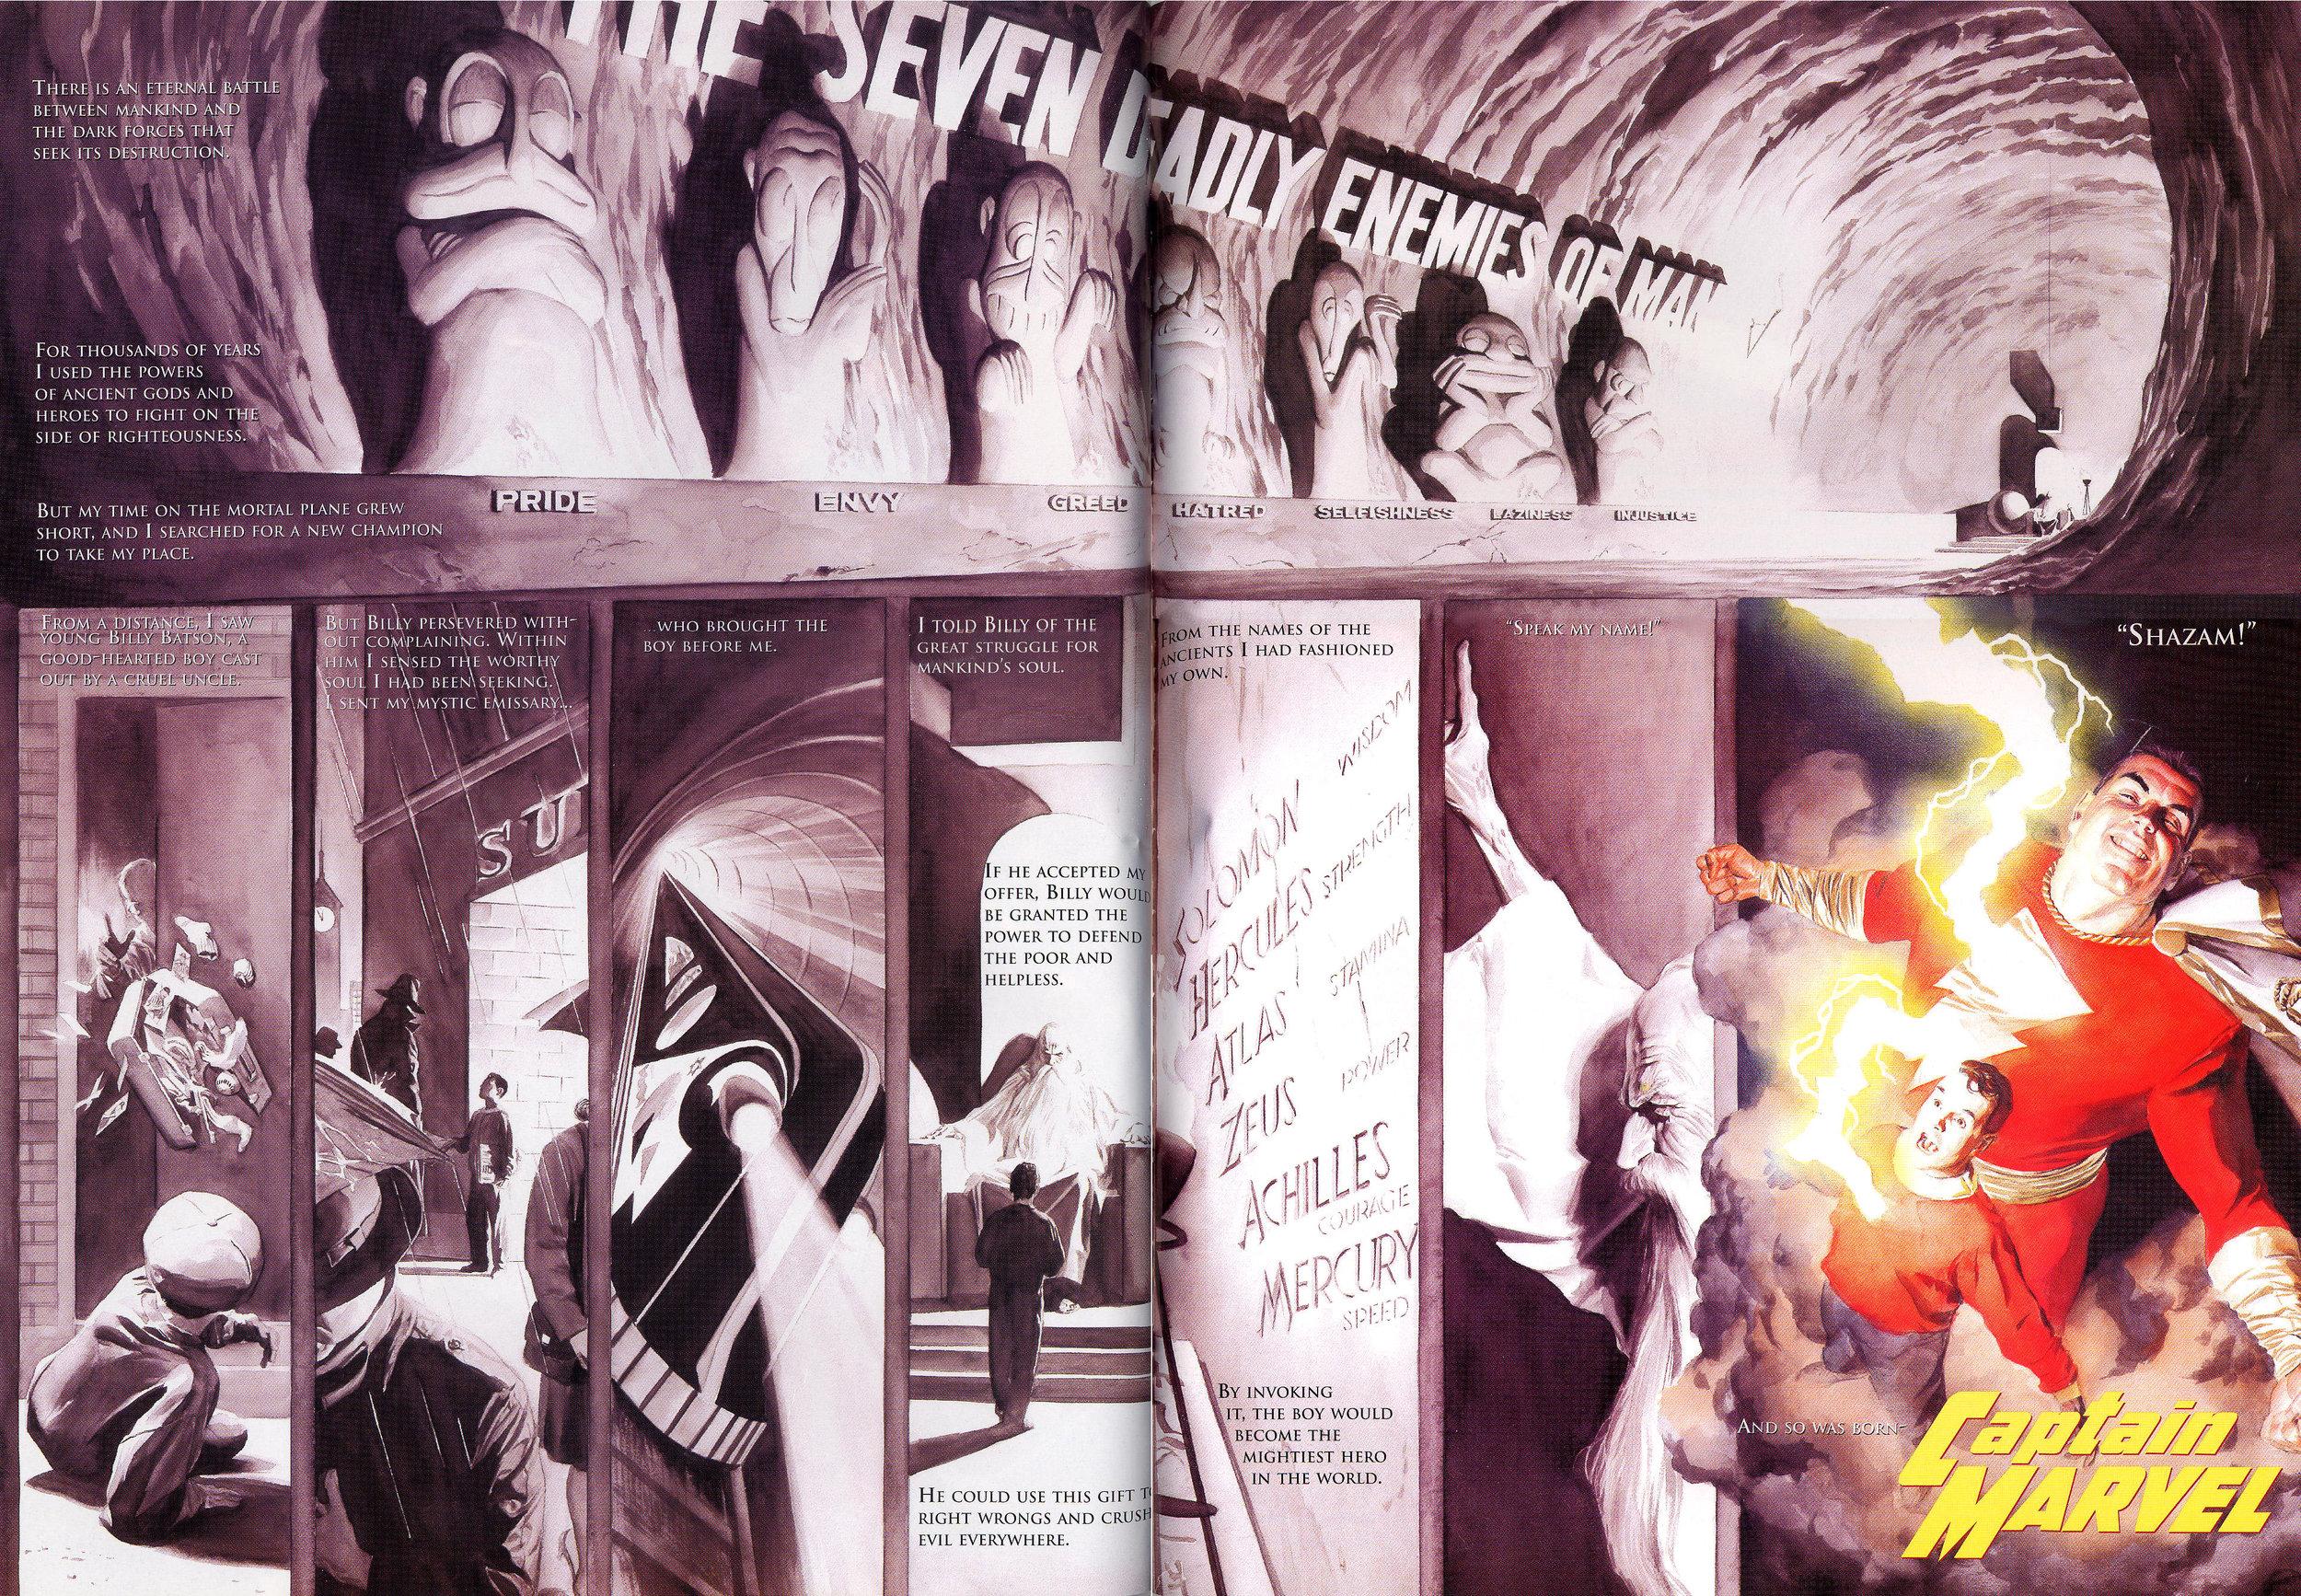 JLA: Secret Origins (2002) Captain Marvel, written by Paul Dini with art by Alex Ross.